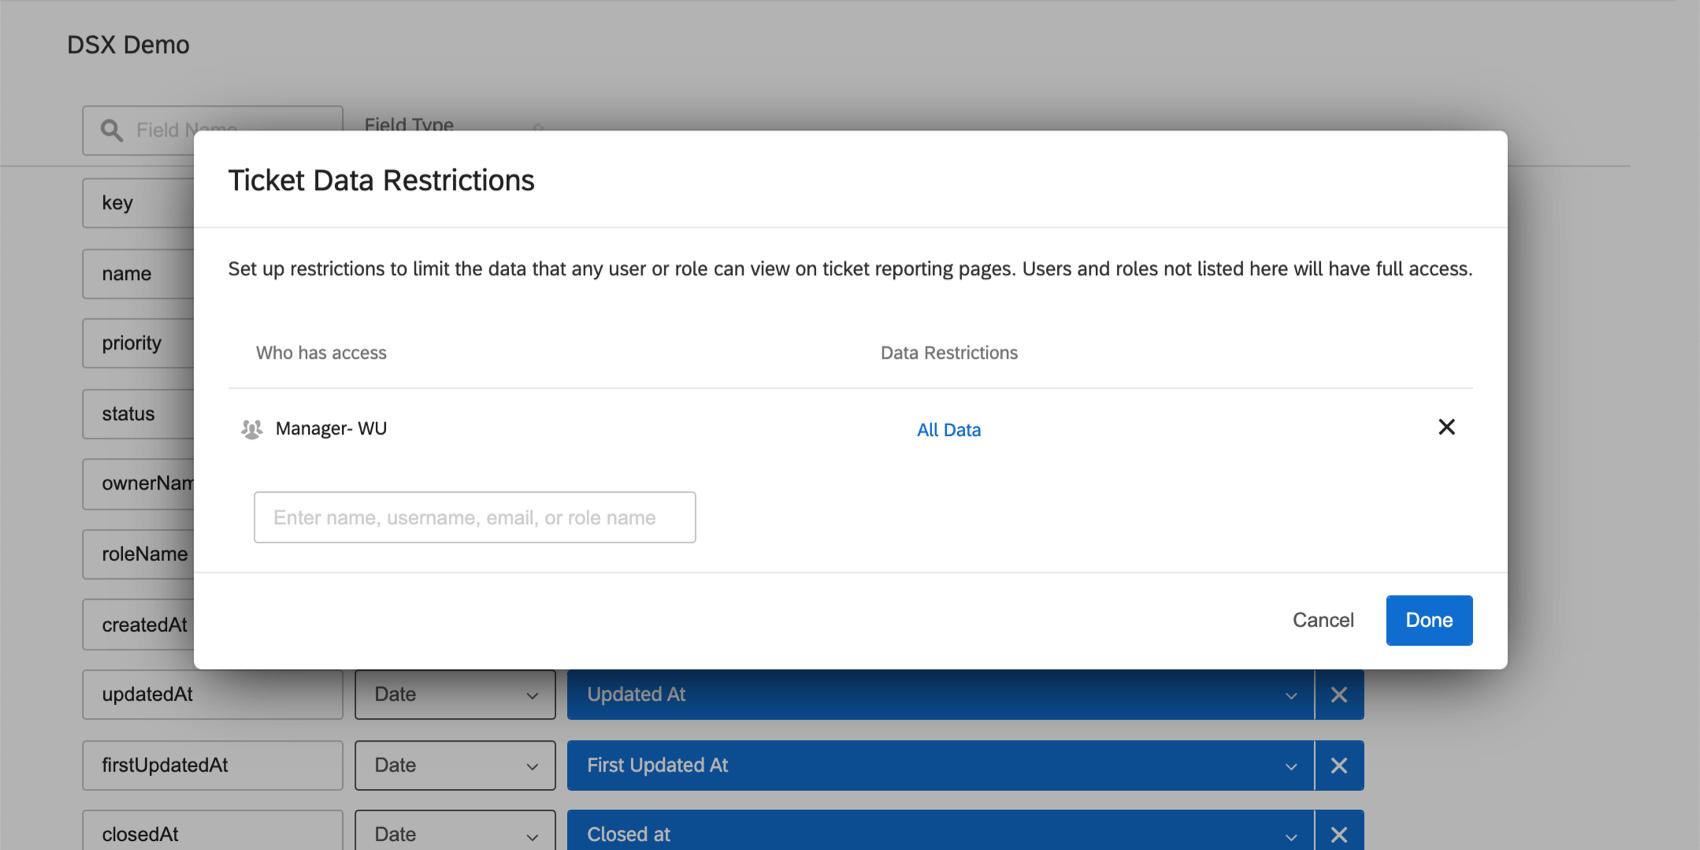 Ticket data restrictions